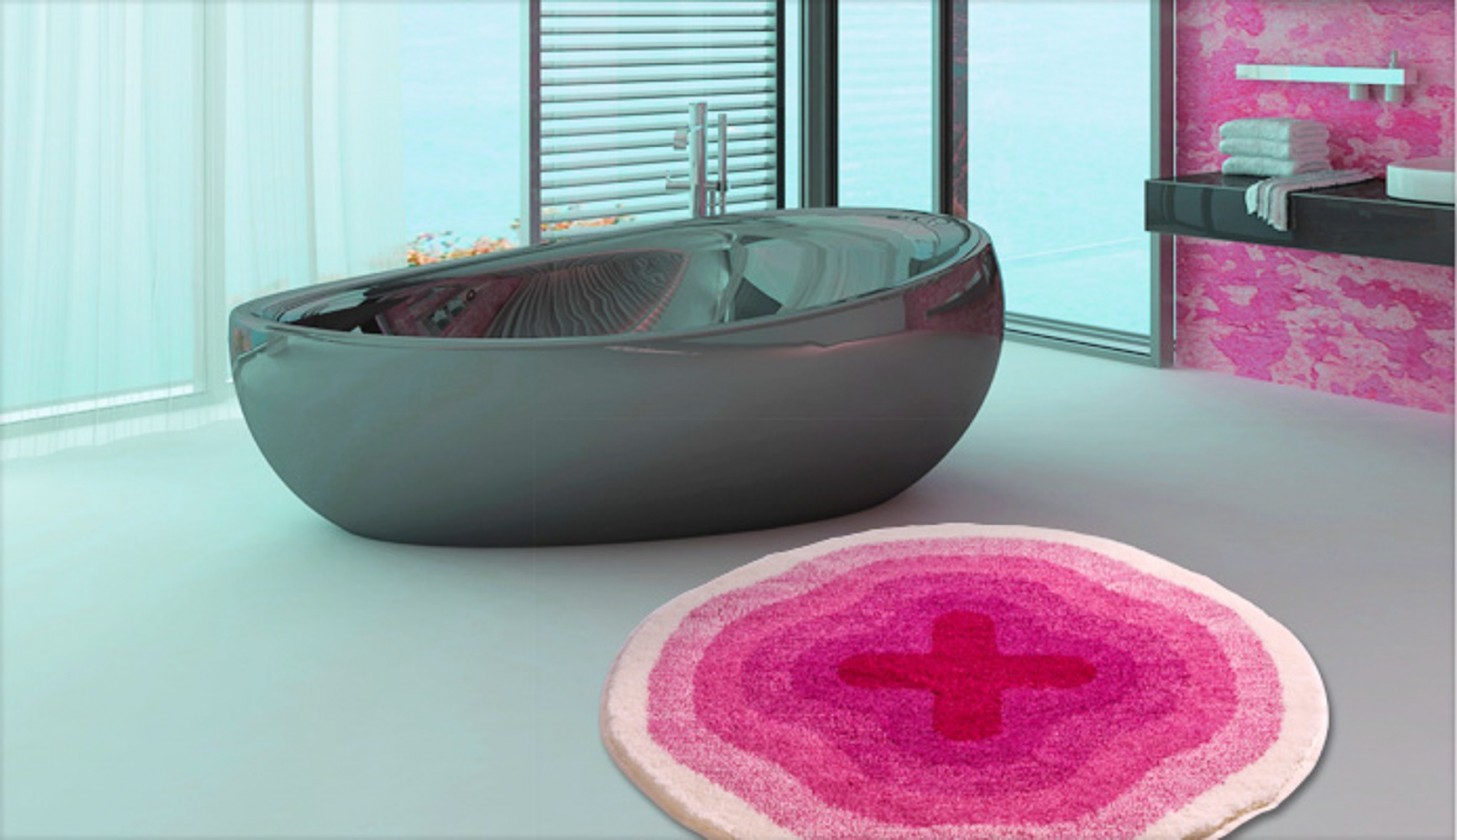 Karim 03 - Předložka kruh 60 cm (ružová)